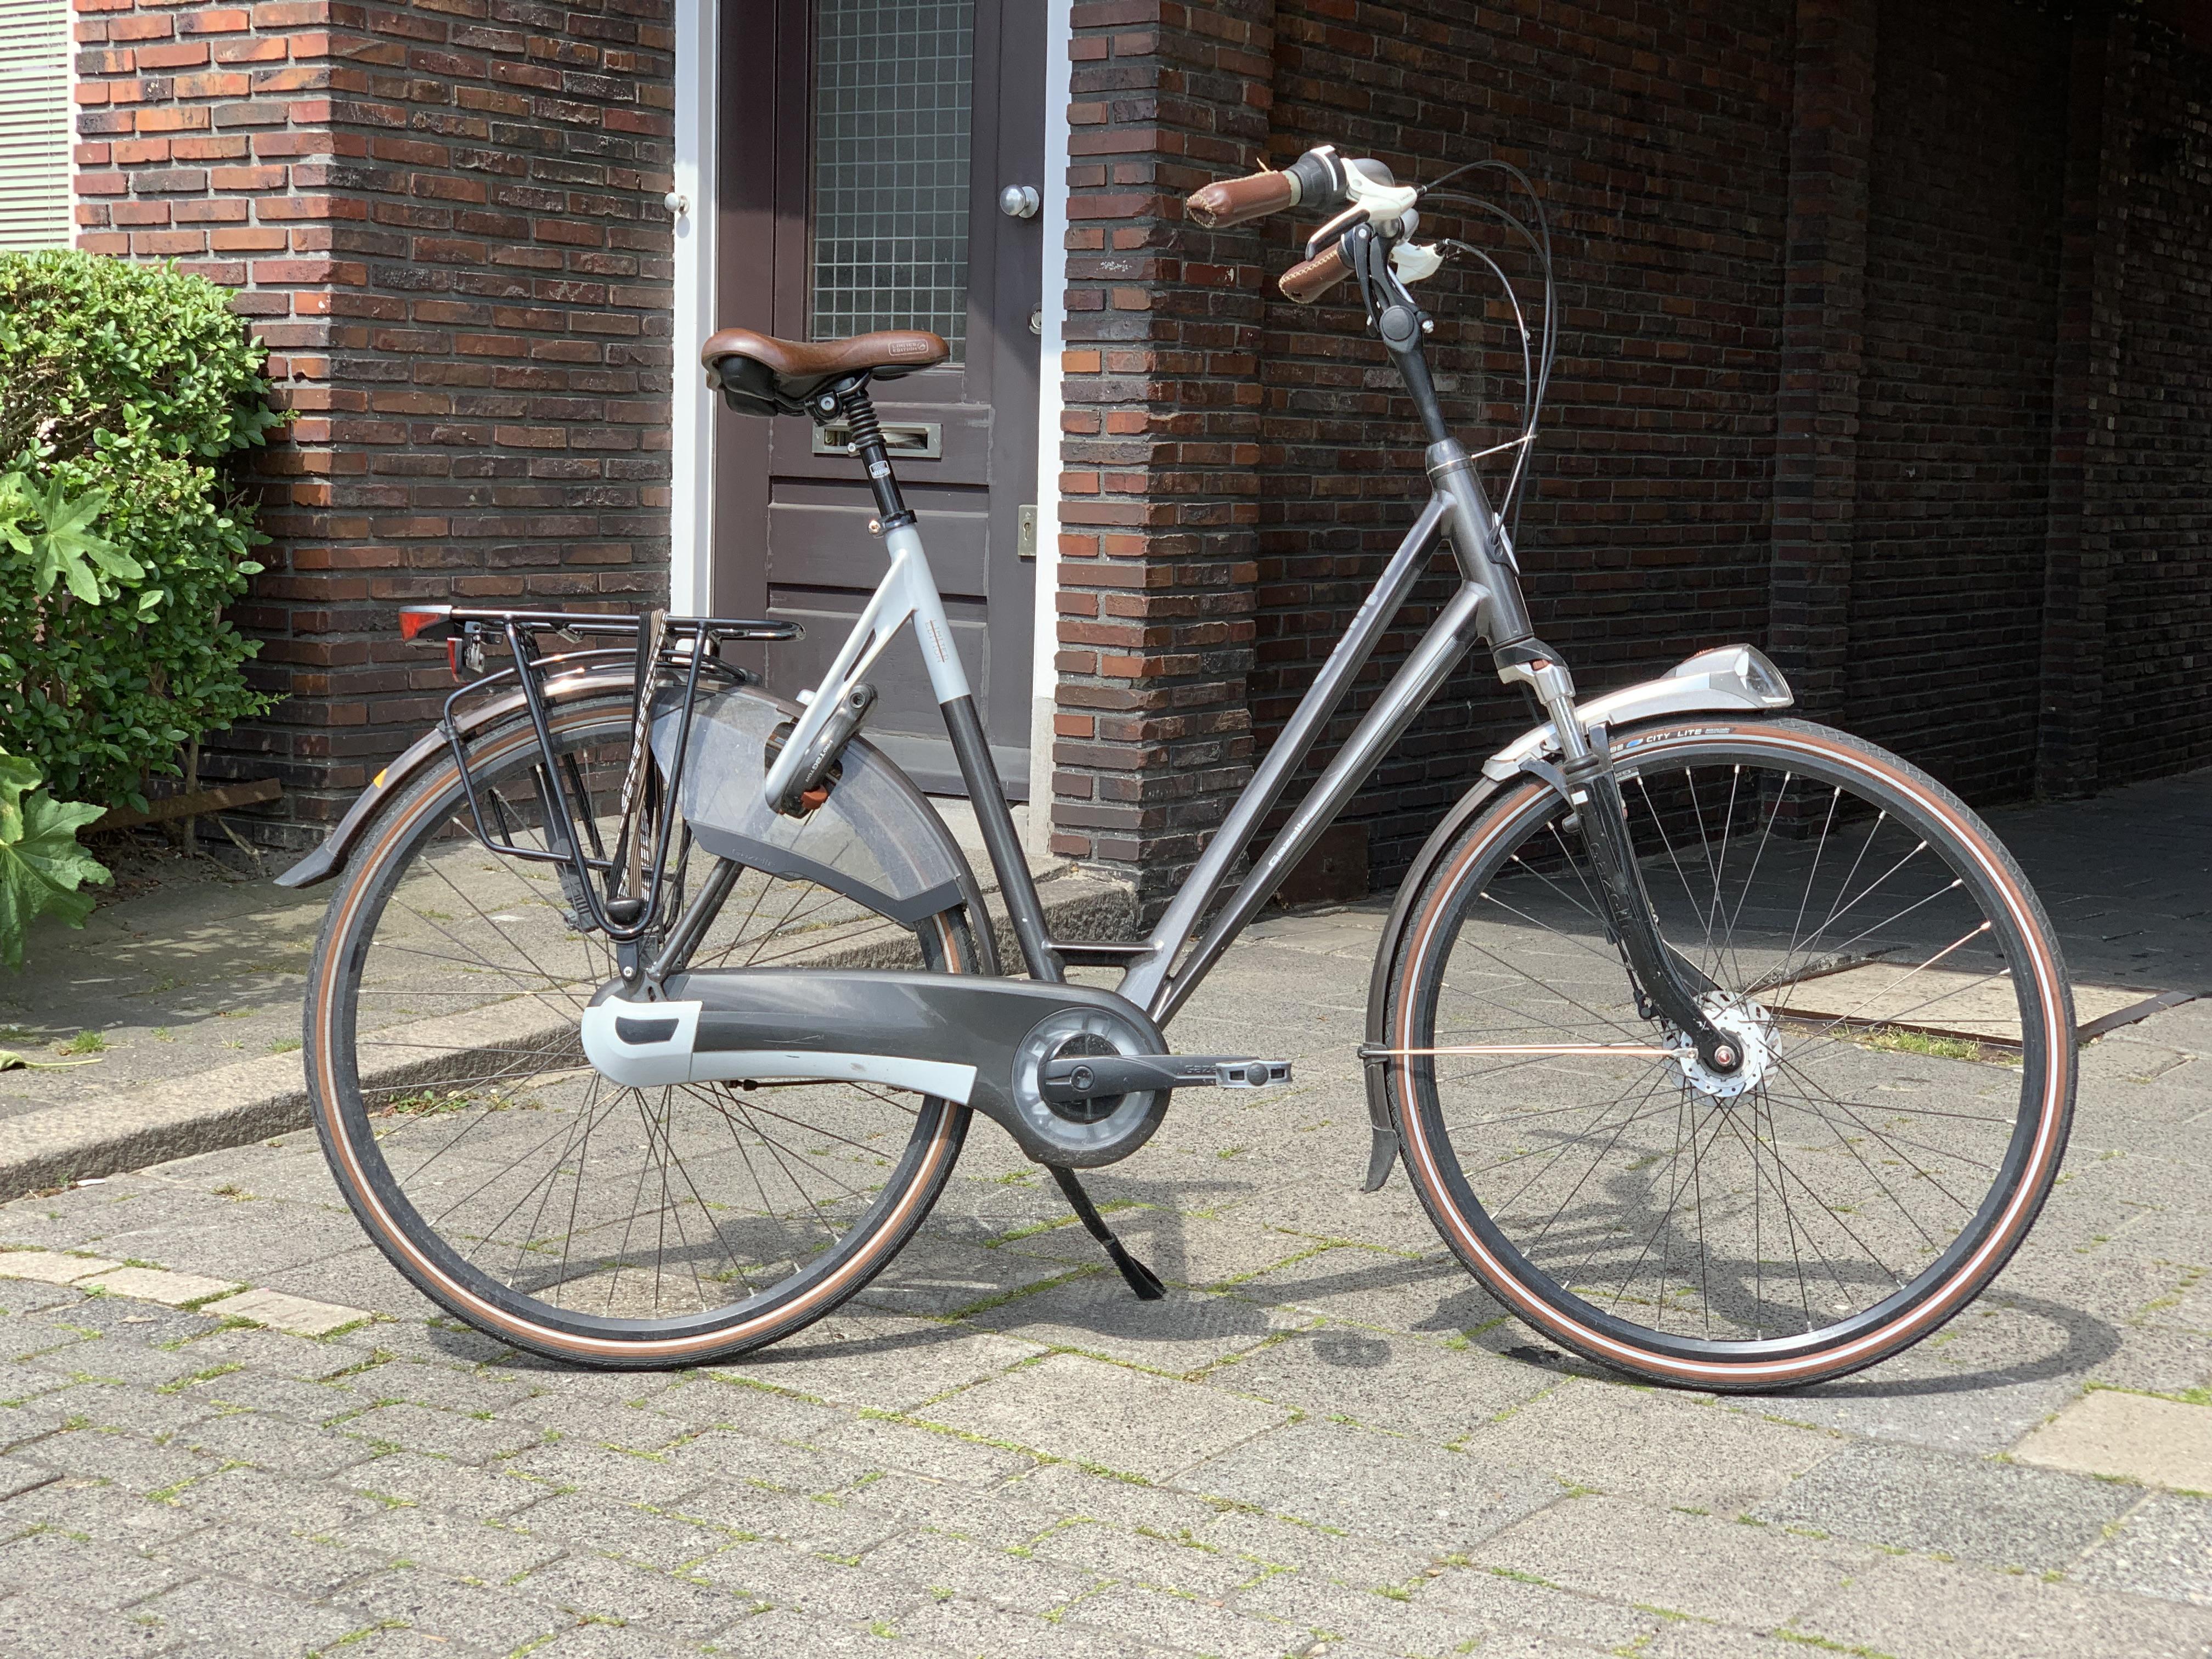 Gazelle Eclipse LTD D57 €395